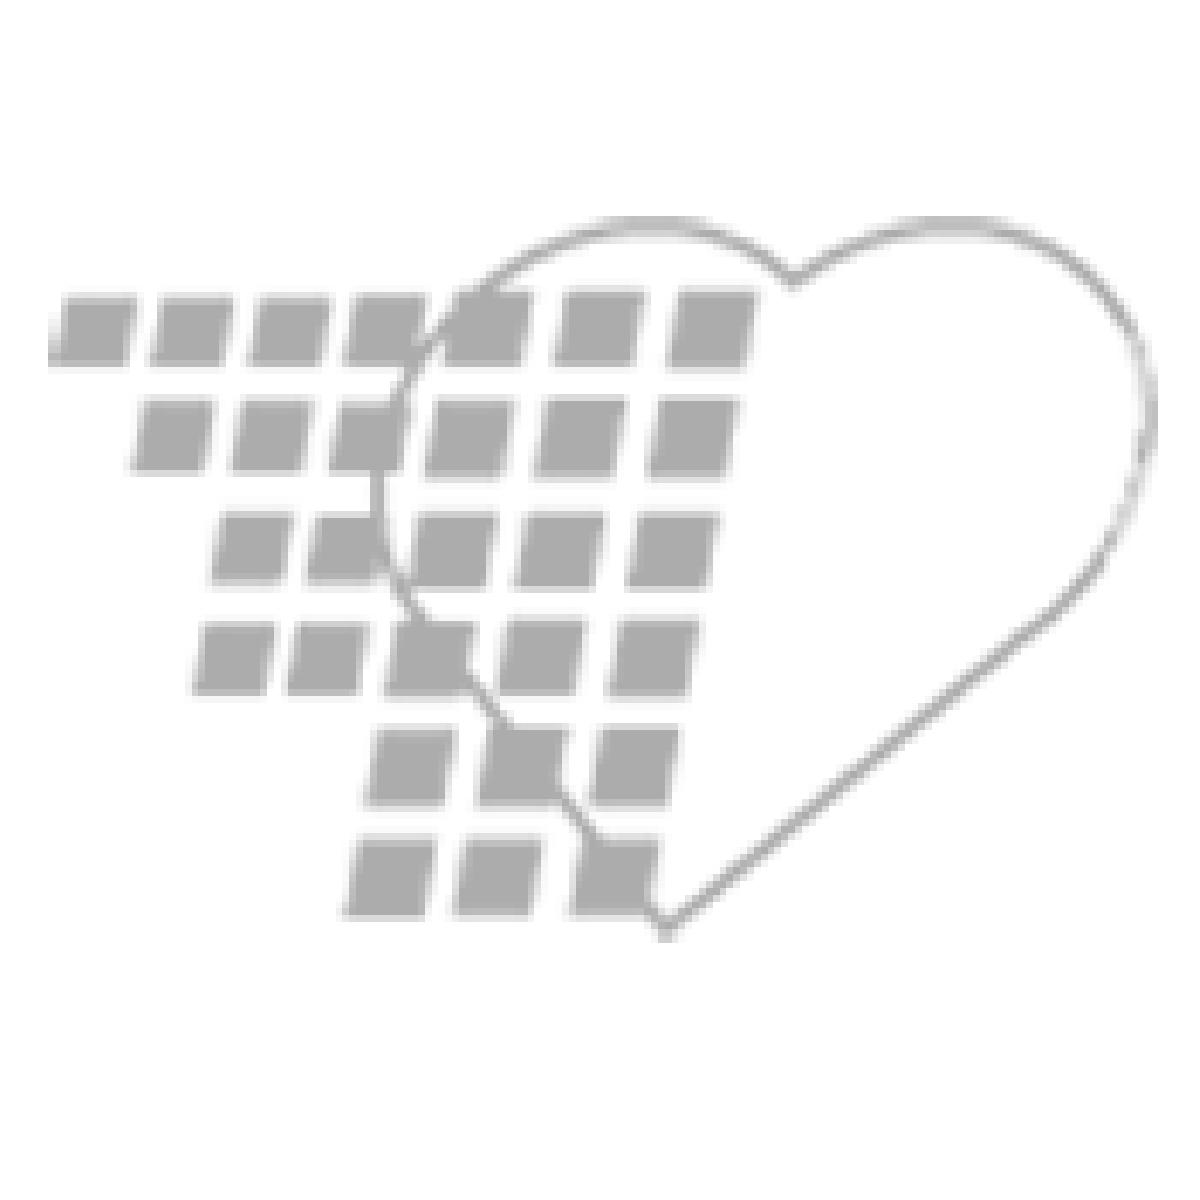 03-18-1741 - Deluxe Biohazard Fluid Spill Kit